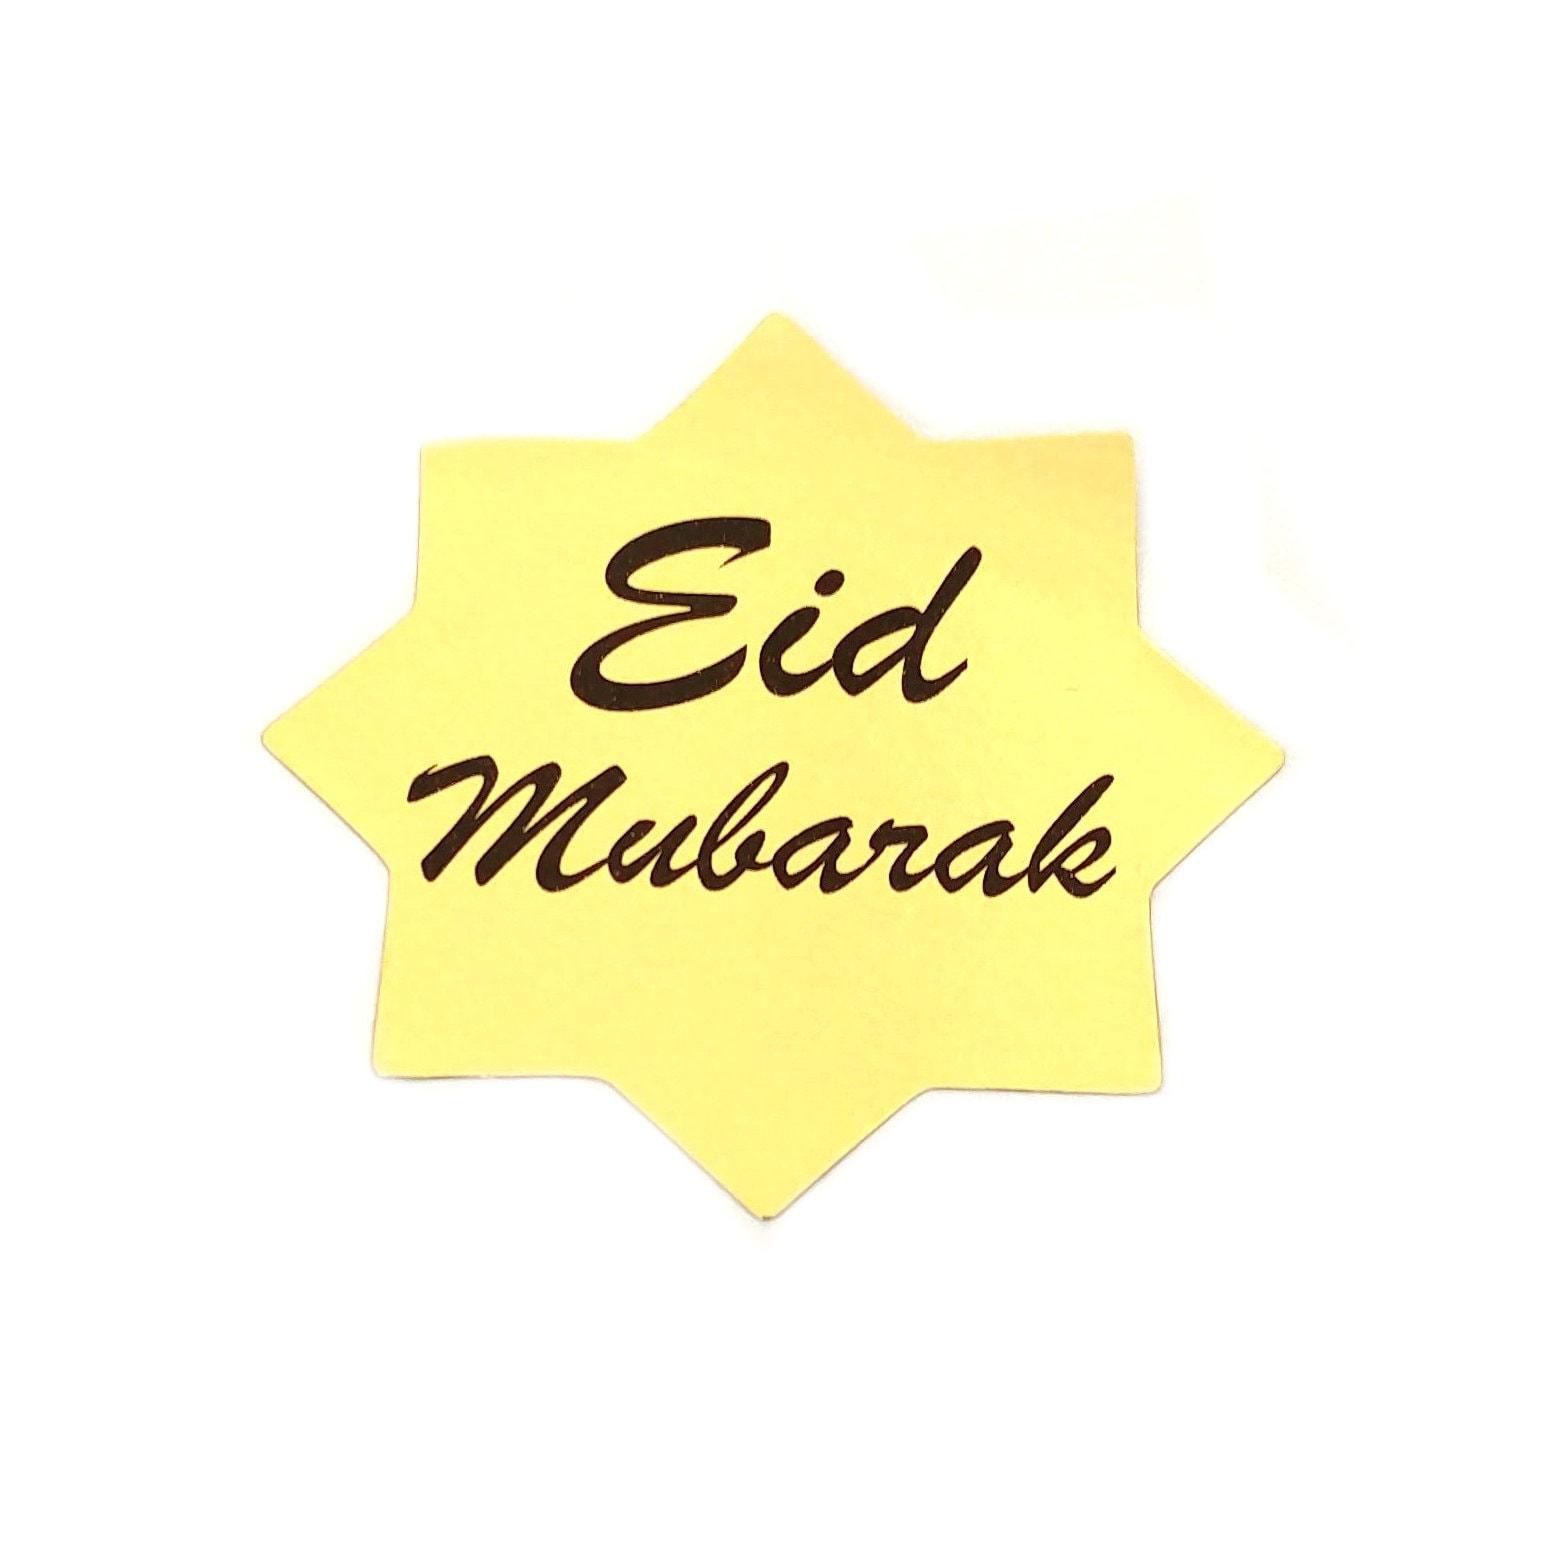 Eid Mubarak Stickers: Eid Stickers Eid Mubarak Stickers Eid Cards Eid Gifts Eid